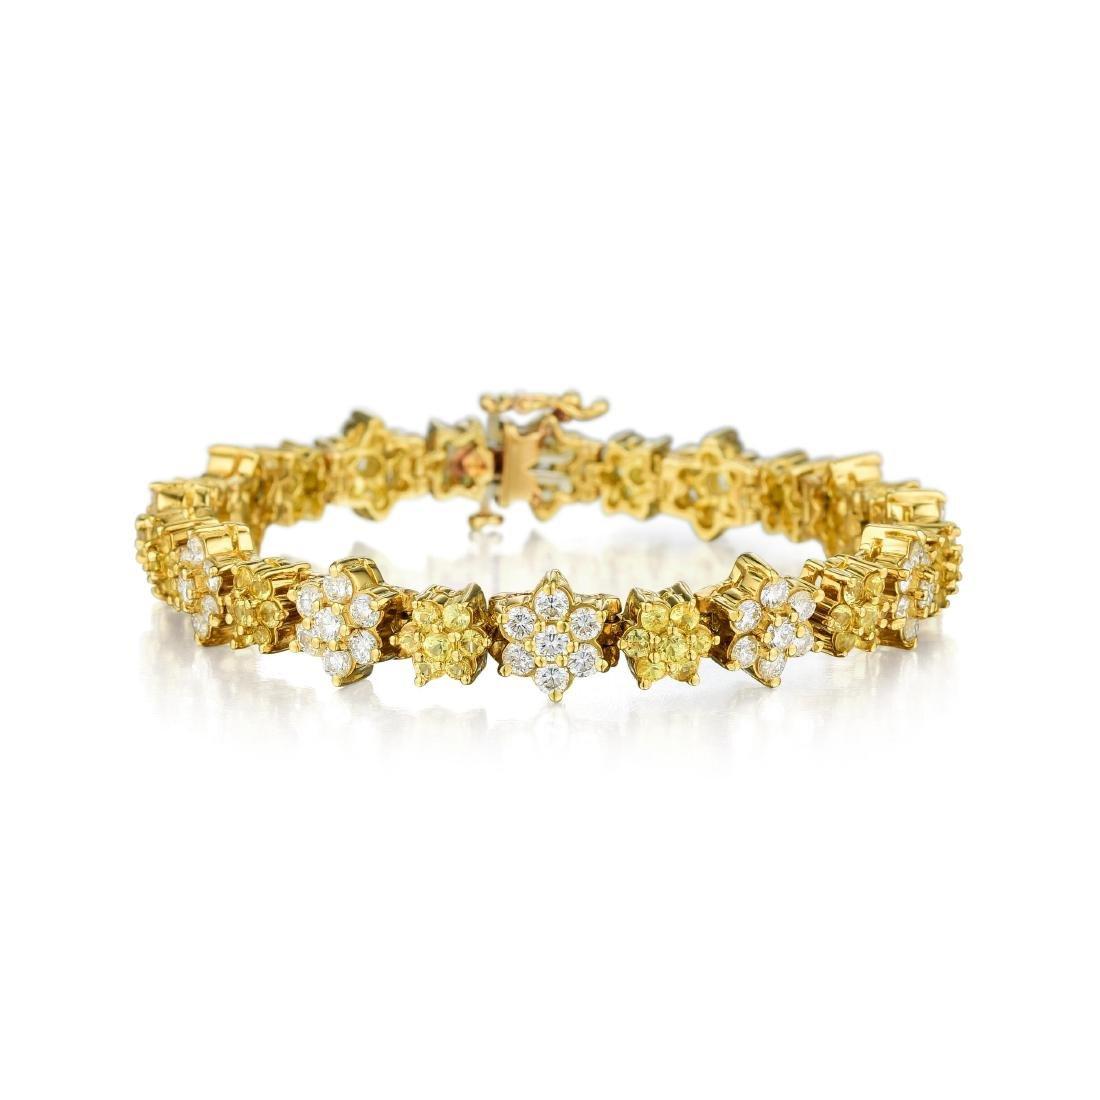 An 18K Gold Diamond and Yellow Sapphire Bracelet